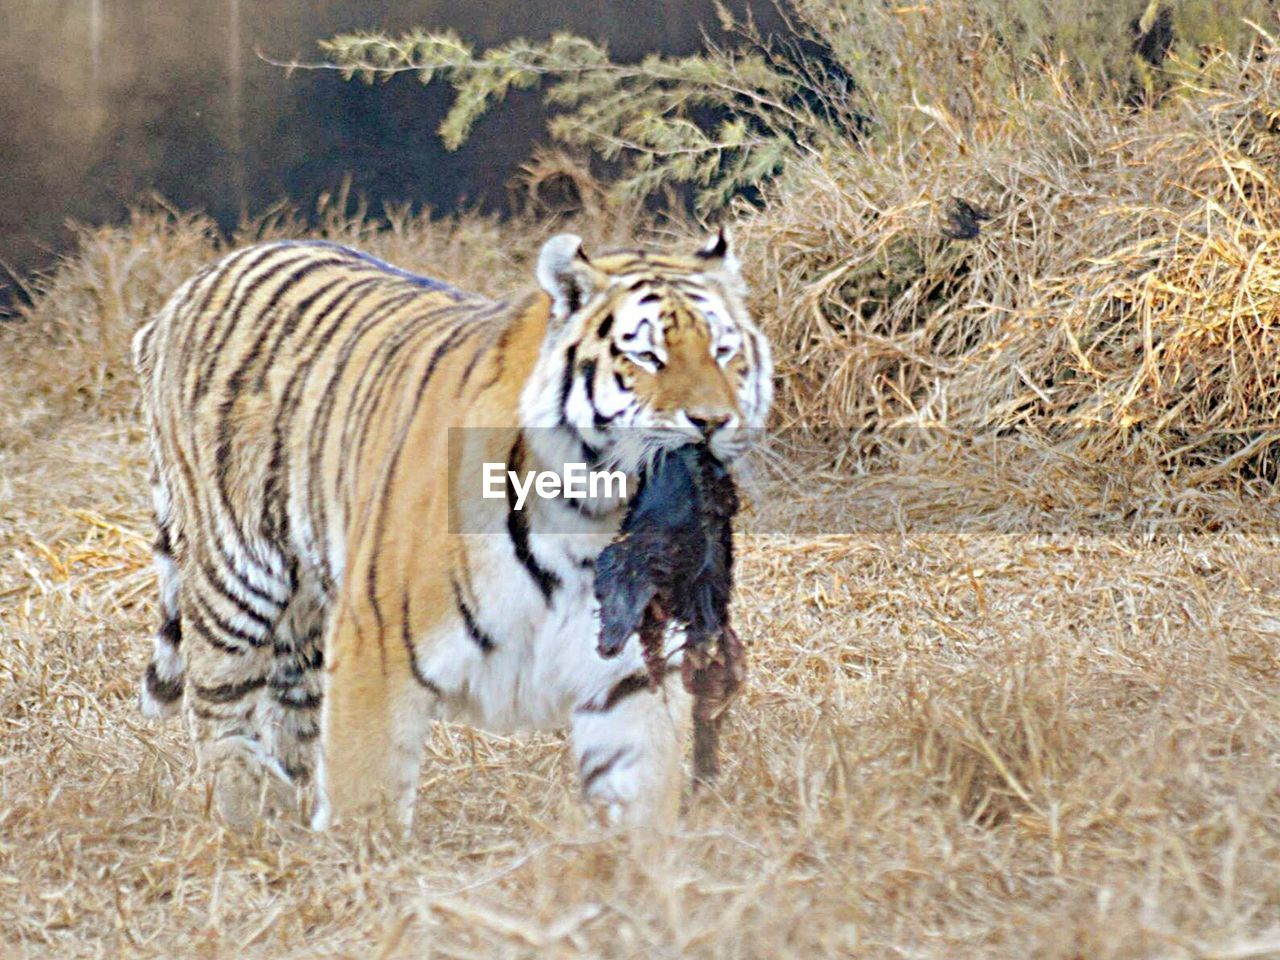 animals in the wild, animal wildlife, one animal, animal themes, tiger, day, no people, mammal, outdoors, nature, grass, full length, portrait, safari animals, zebra